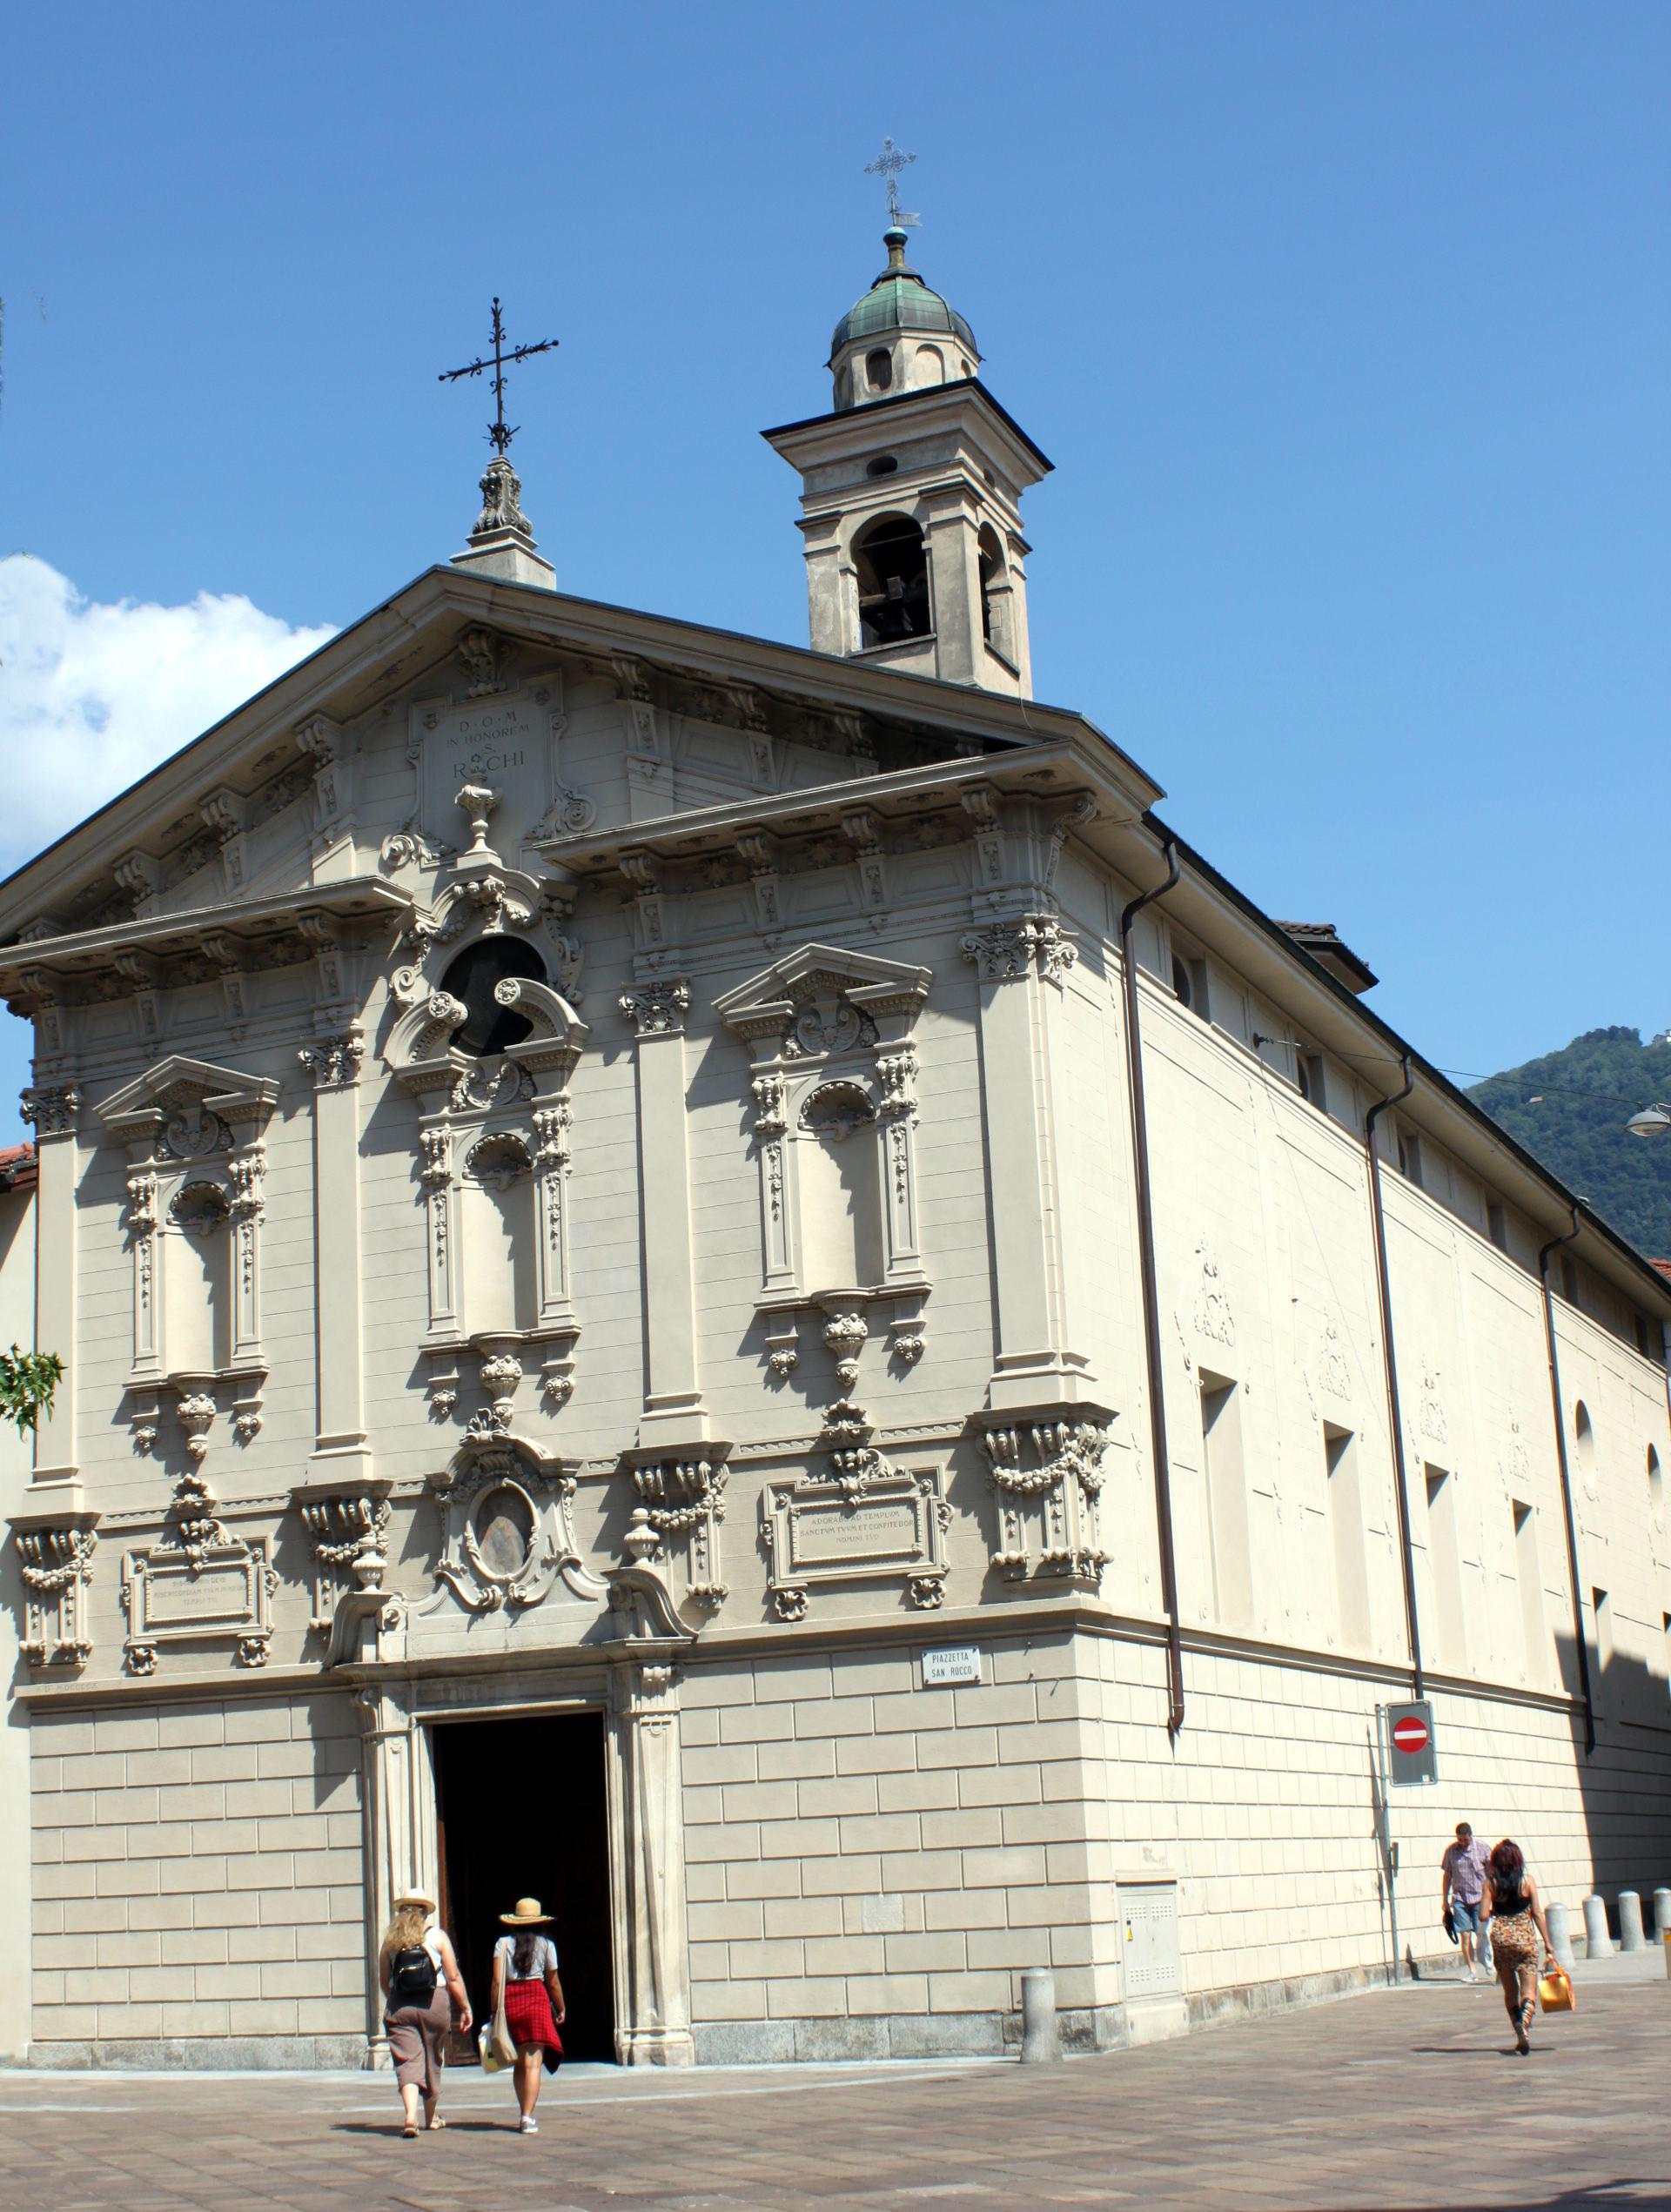 szwajcaria lugano kosciolswrocha chiesasanroccolugano zwiedzanielugano zabytkilugano iglawpodrozy